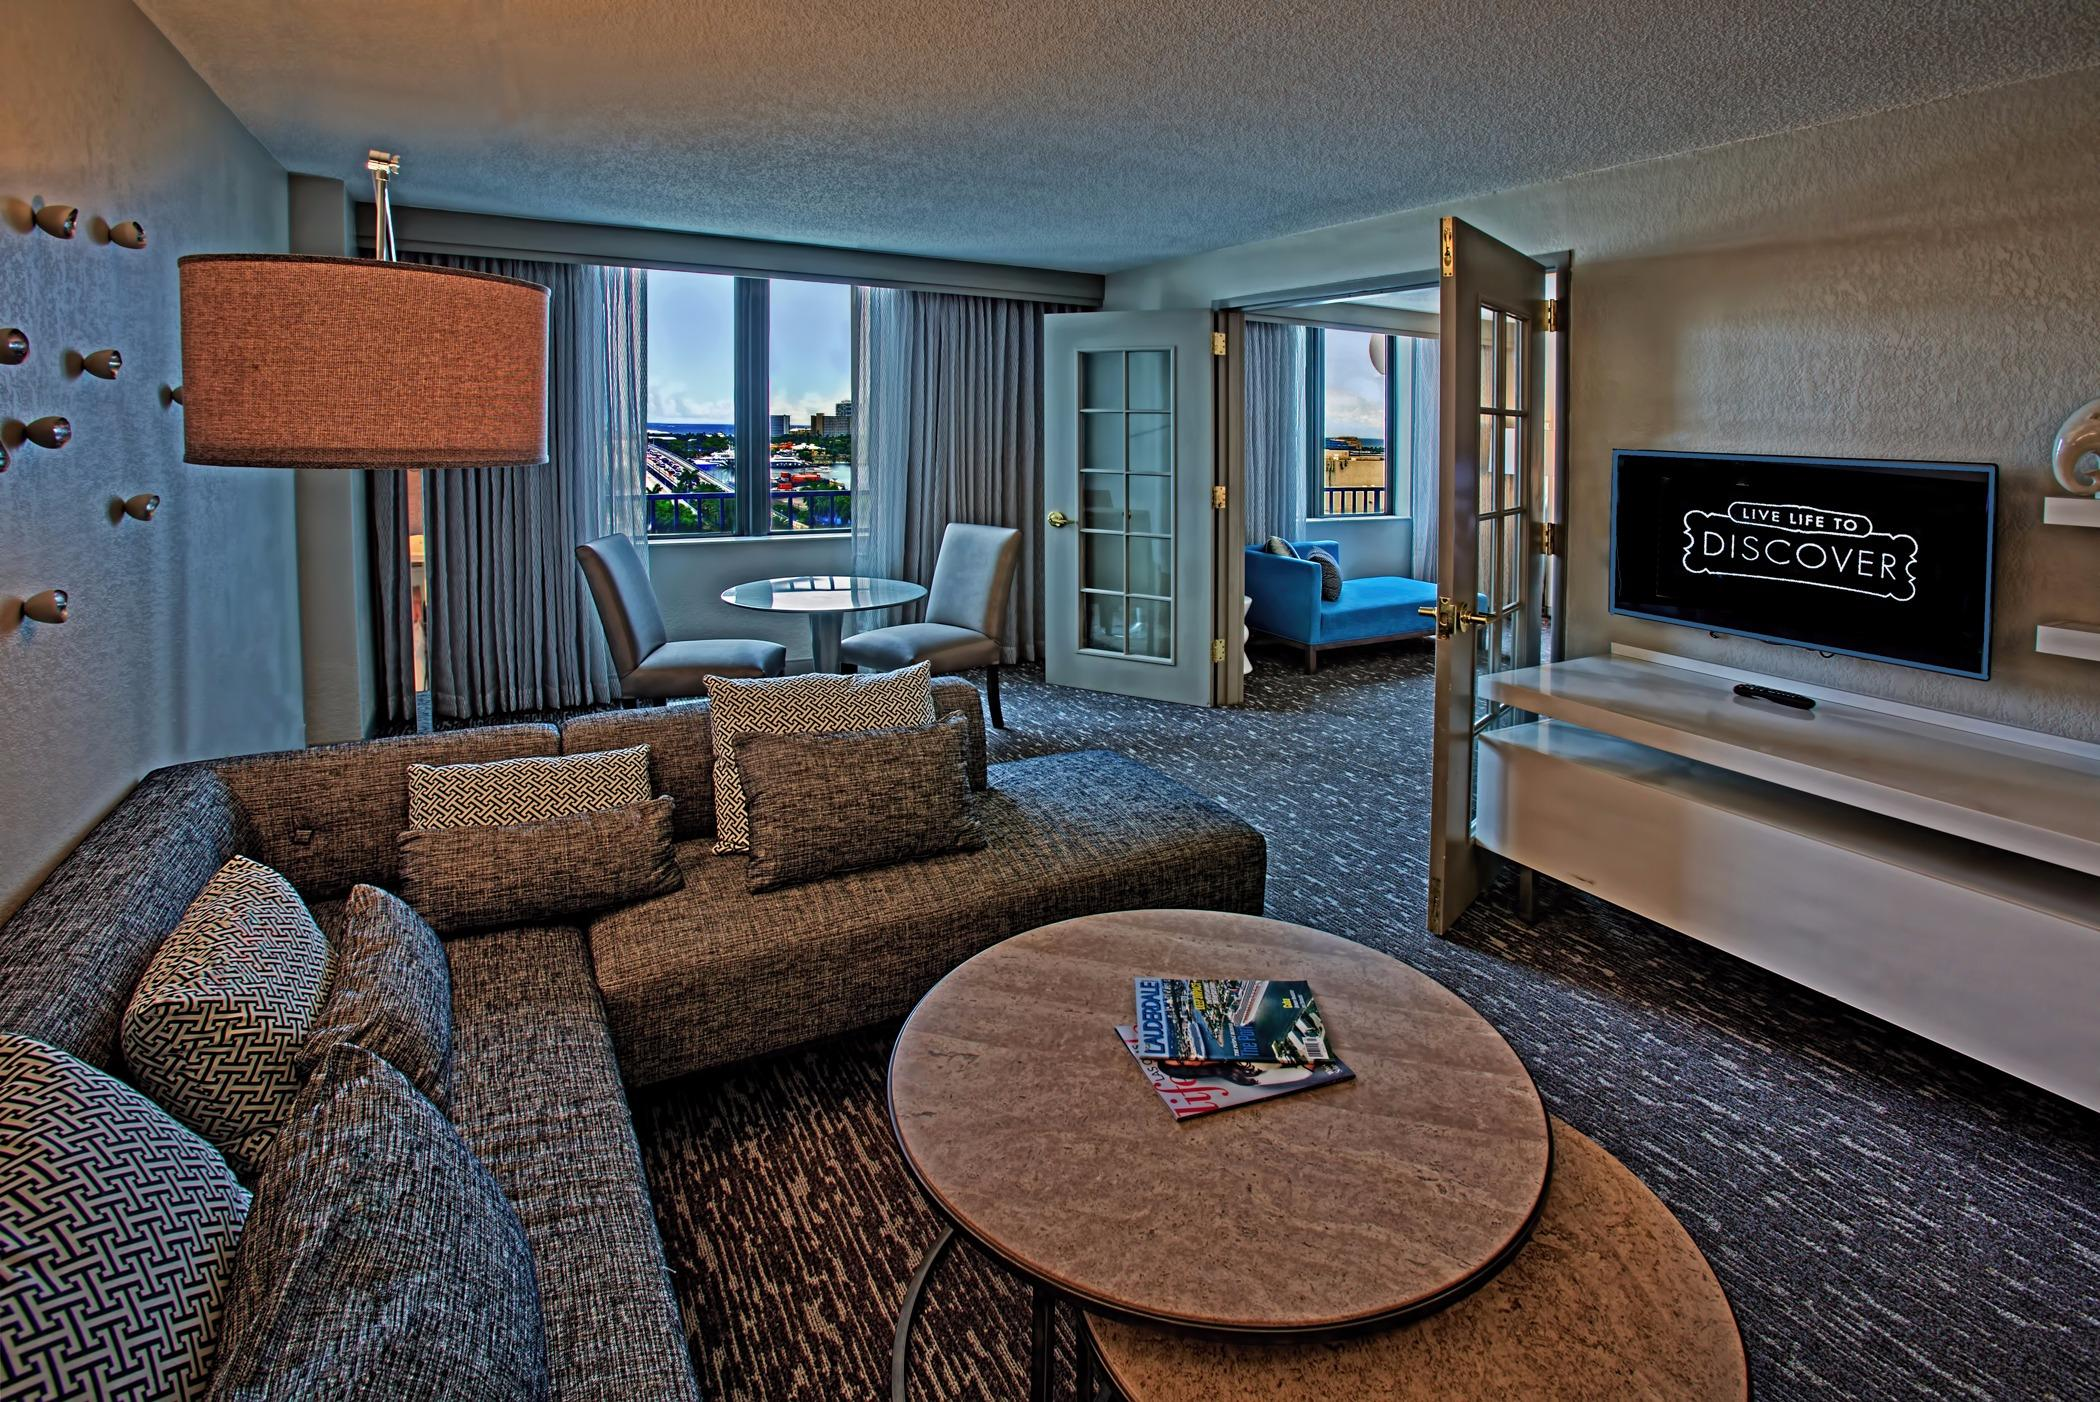 Renaissance Fort Lauderdale Cruise Port Hotel image 8